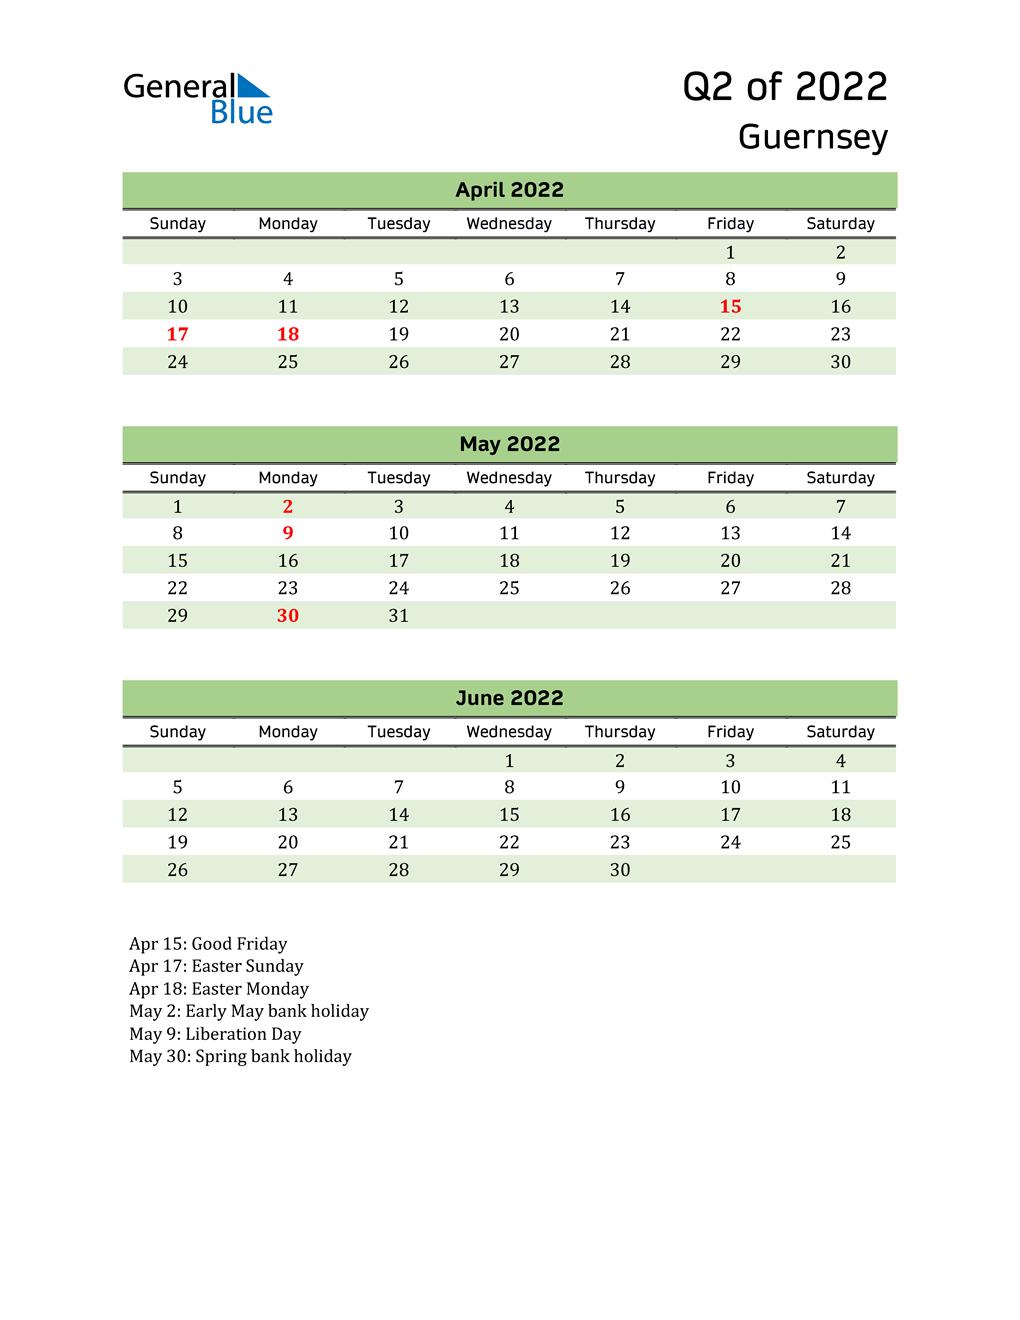 Quarterly Calendar 2022 with Guernsey Holidays